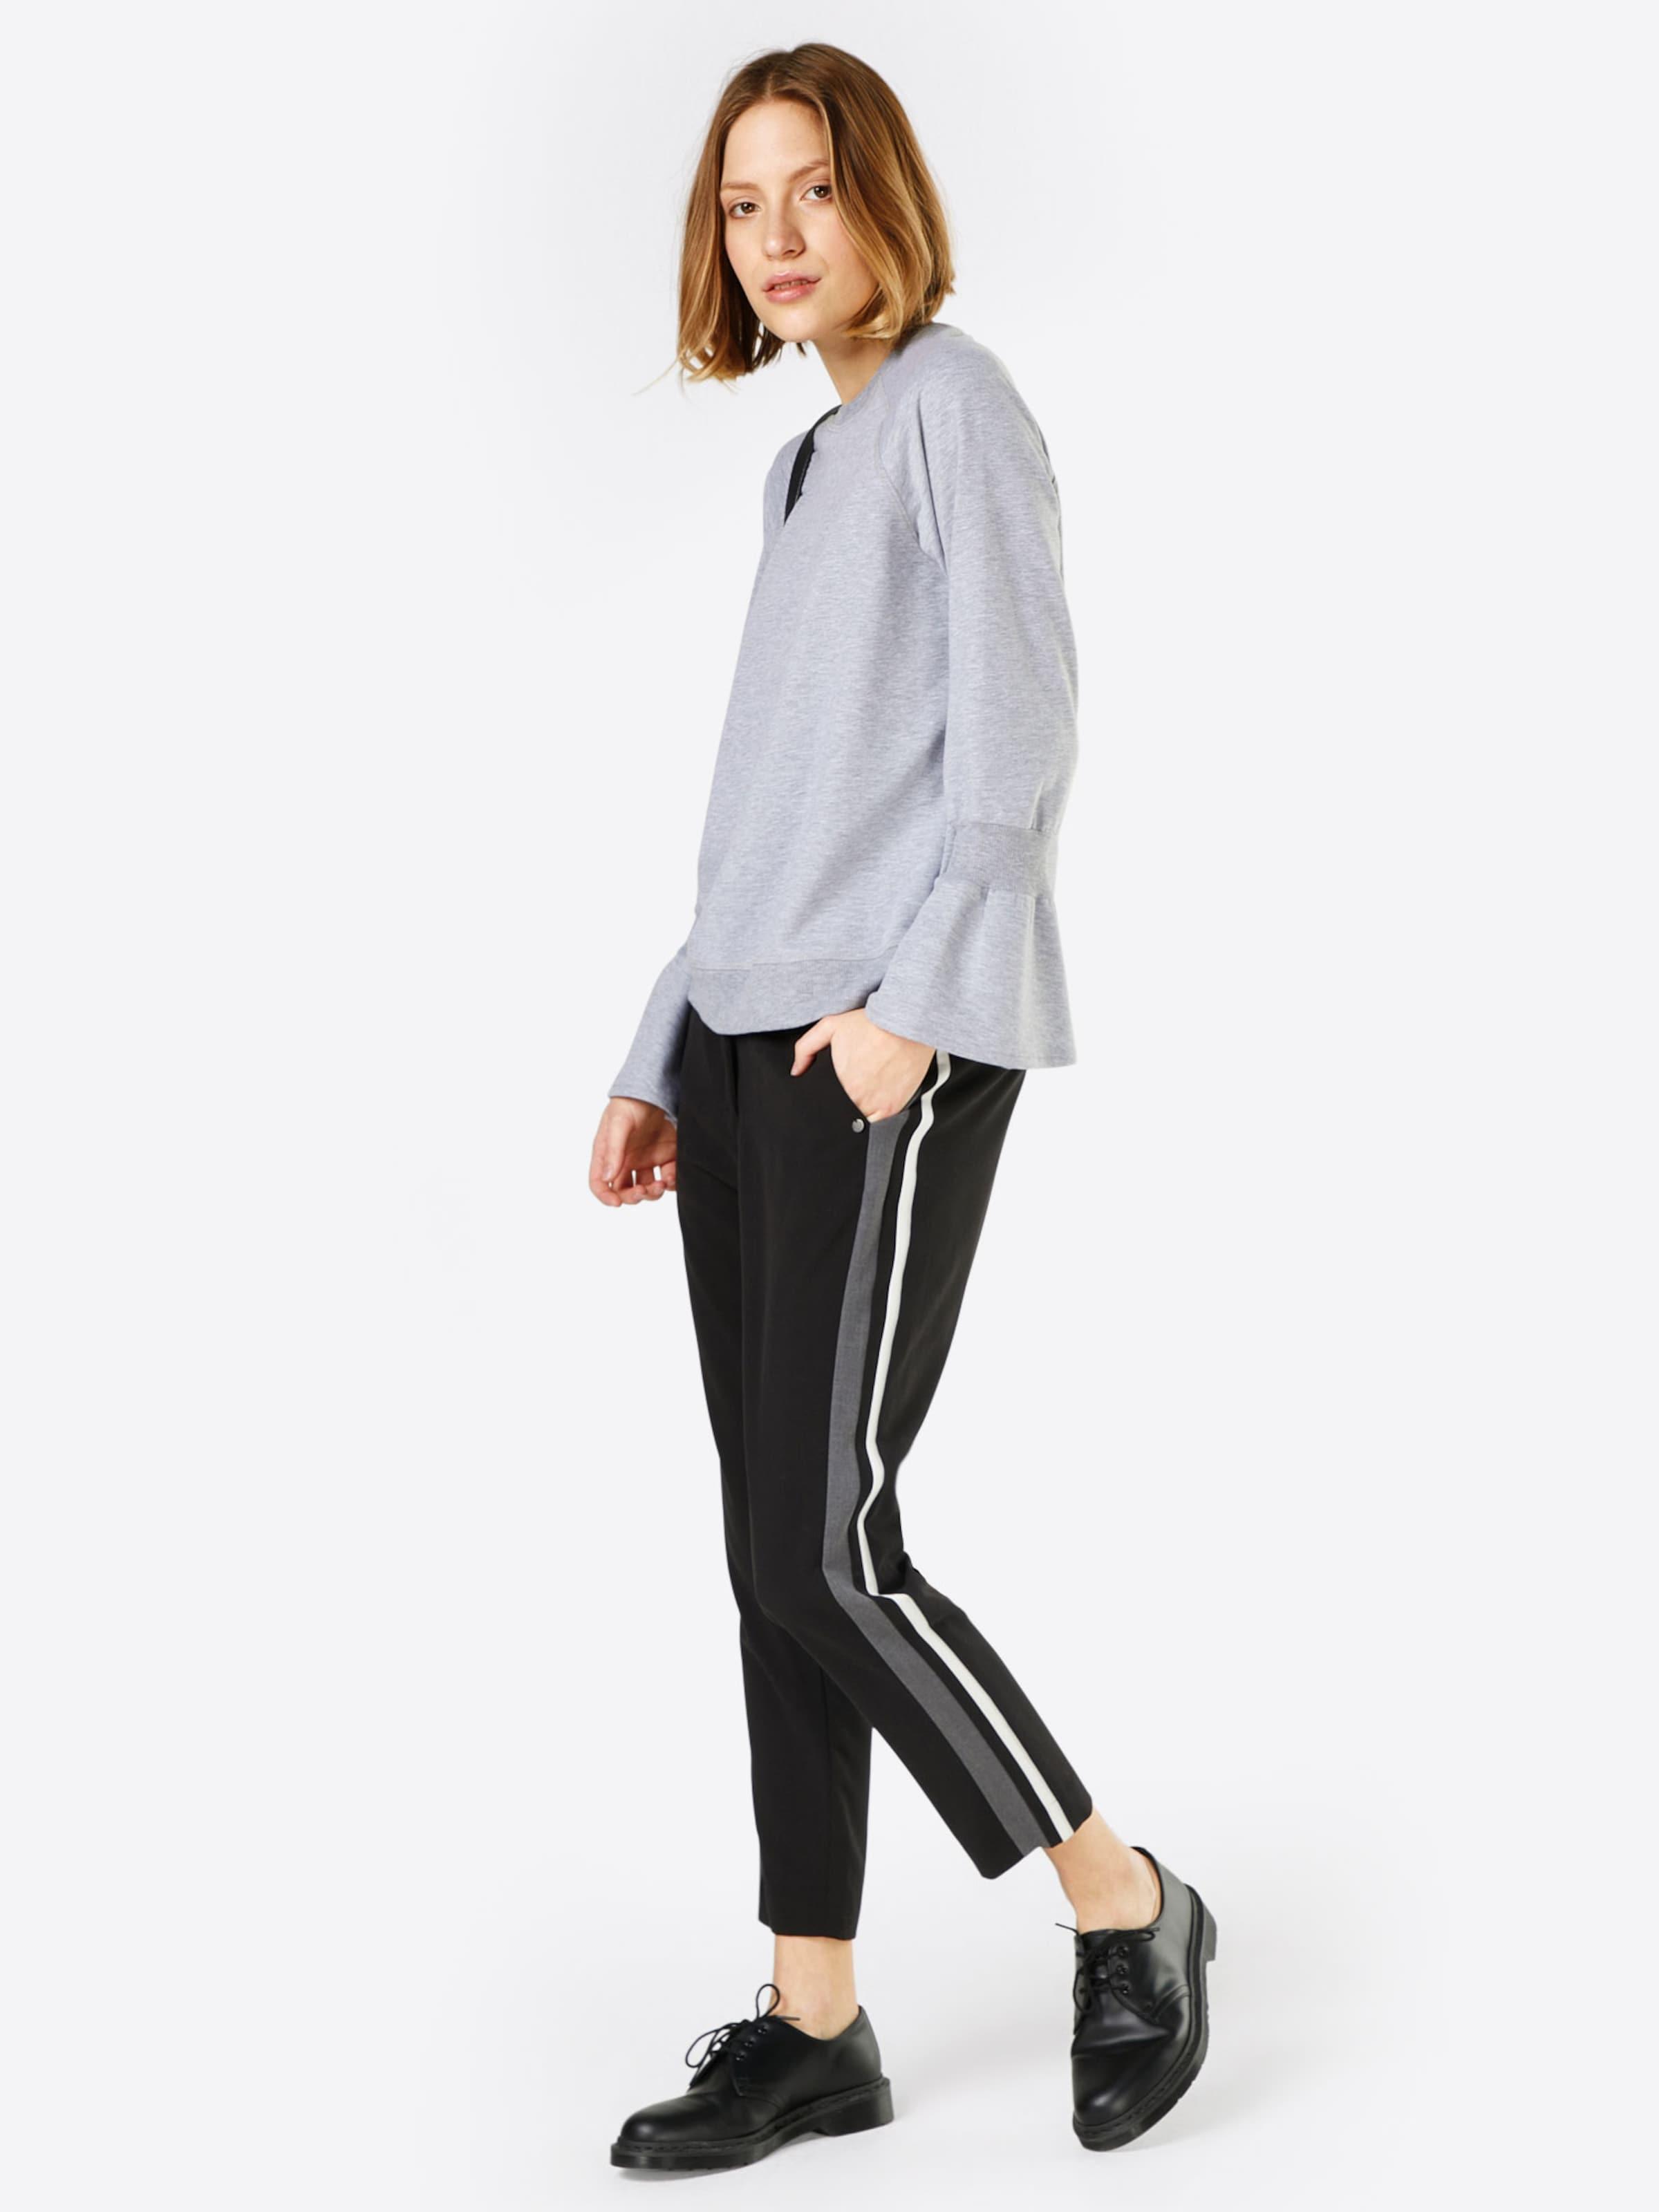 Sweater Grau U Faden In Nadel tsBQhCrxd